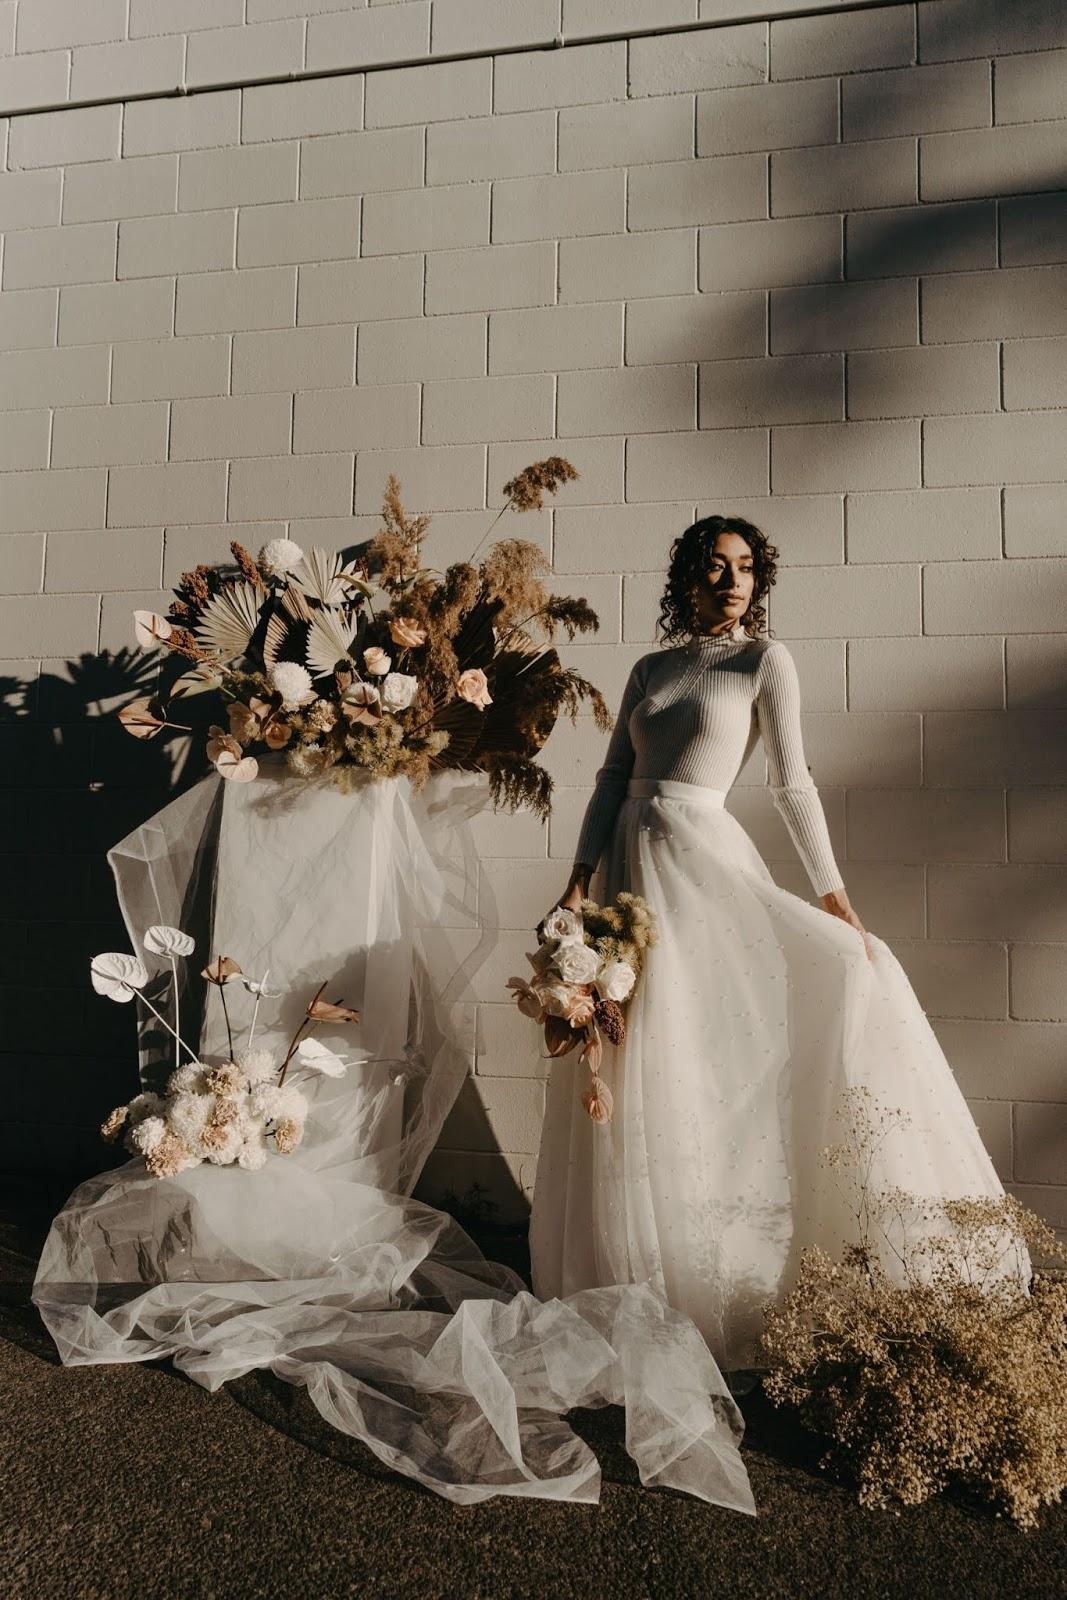 angela cannavo photography weddings sunshine coast wedding skirt bridal bouquet florals bride